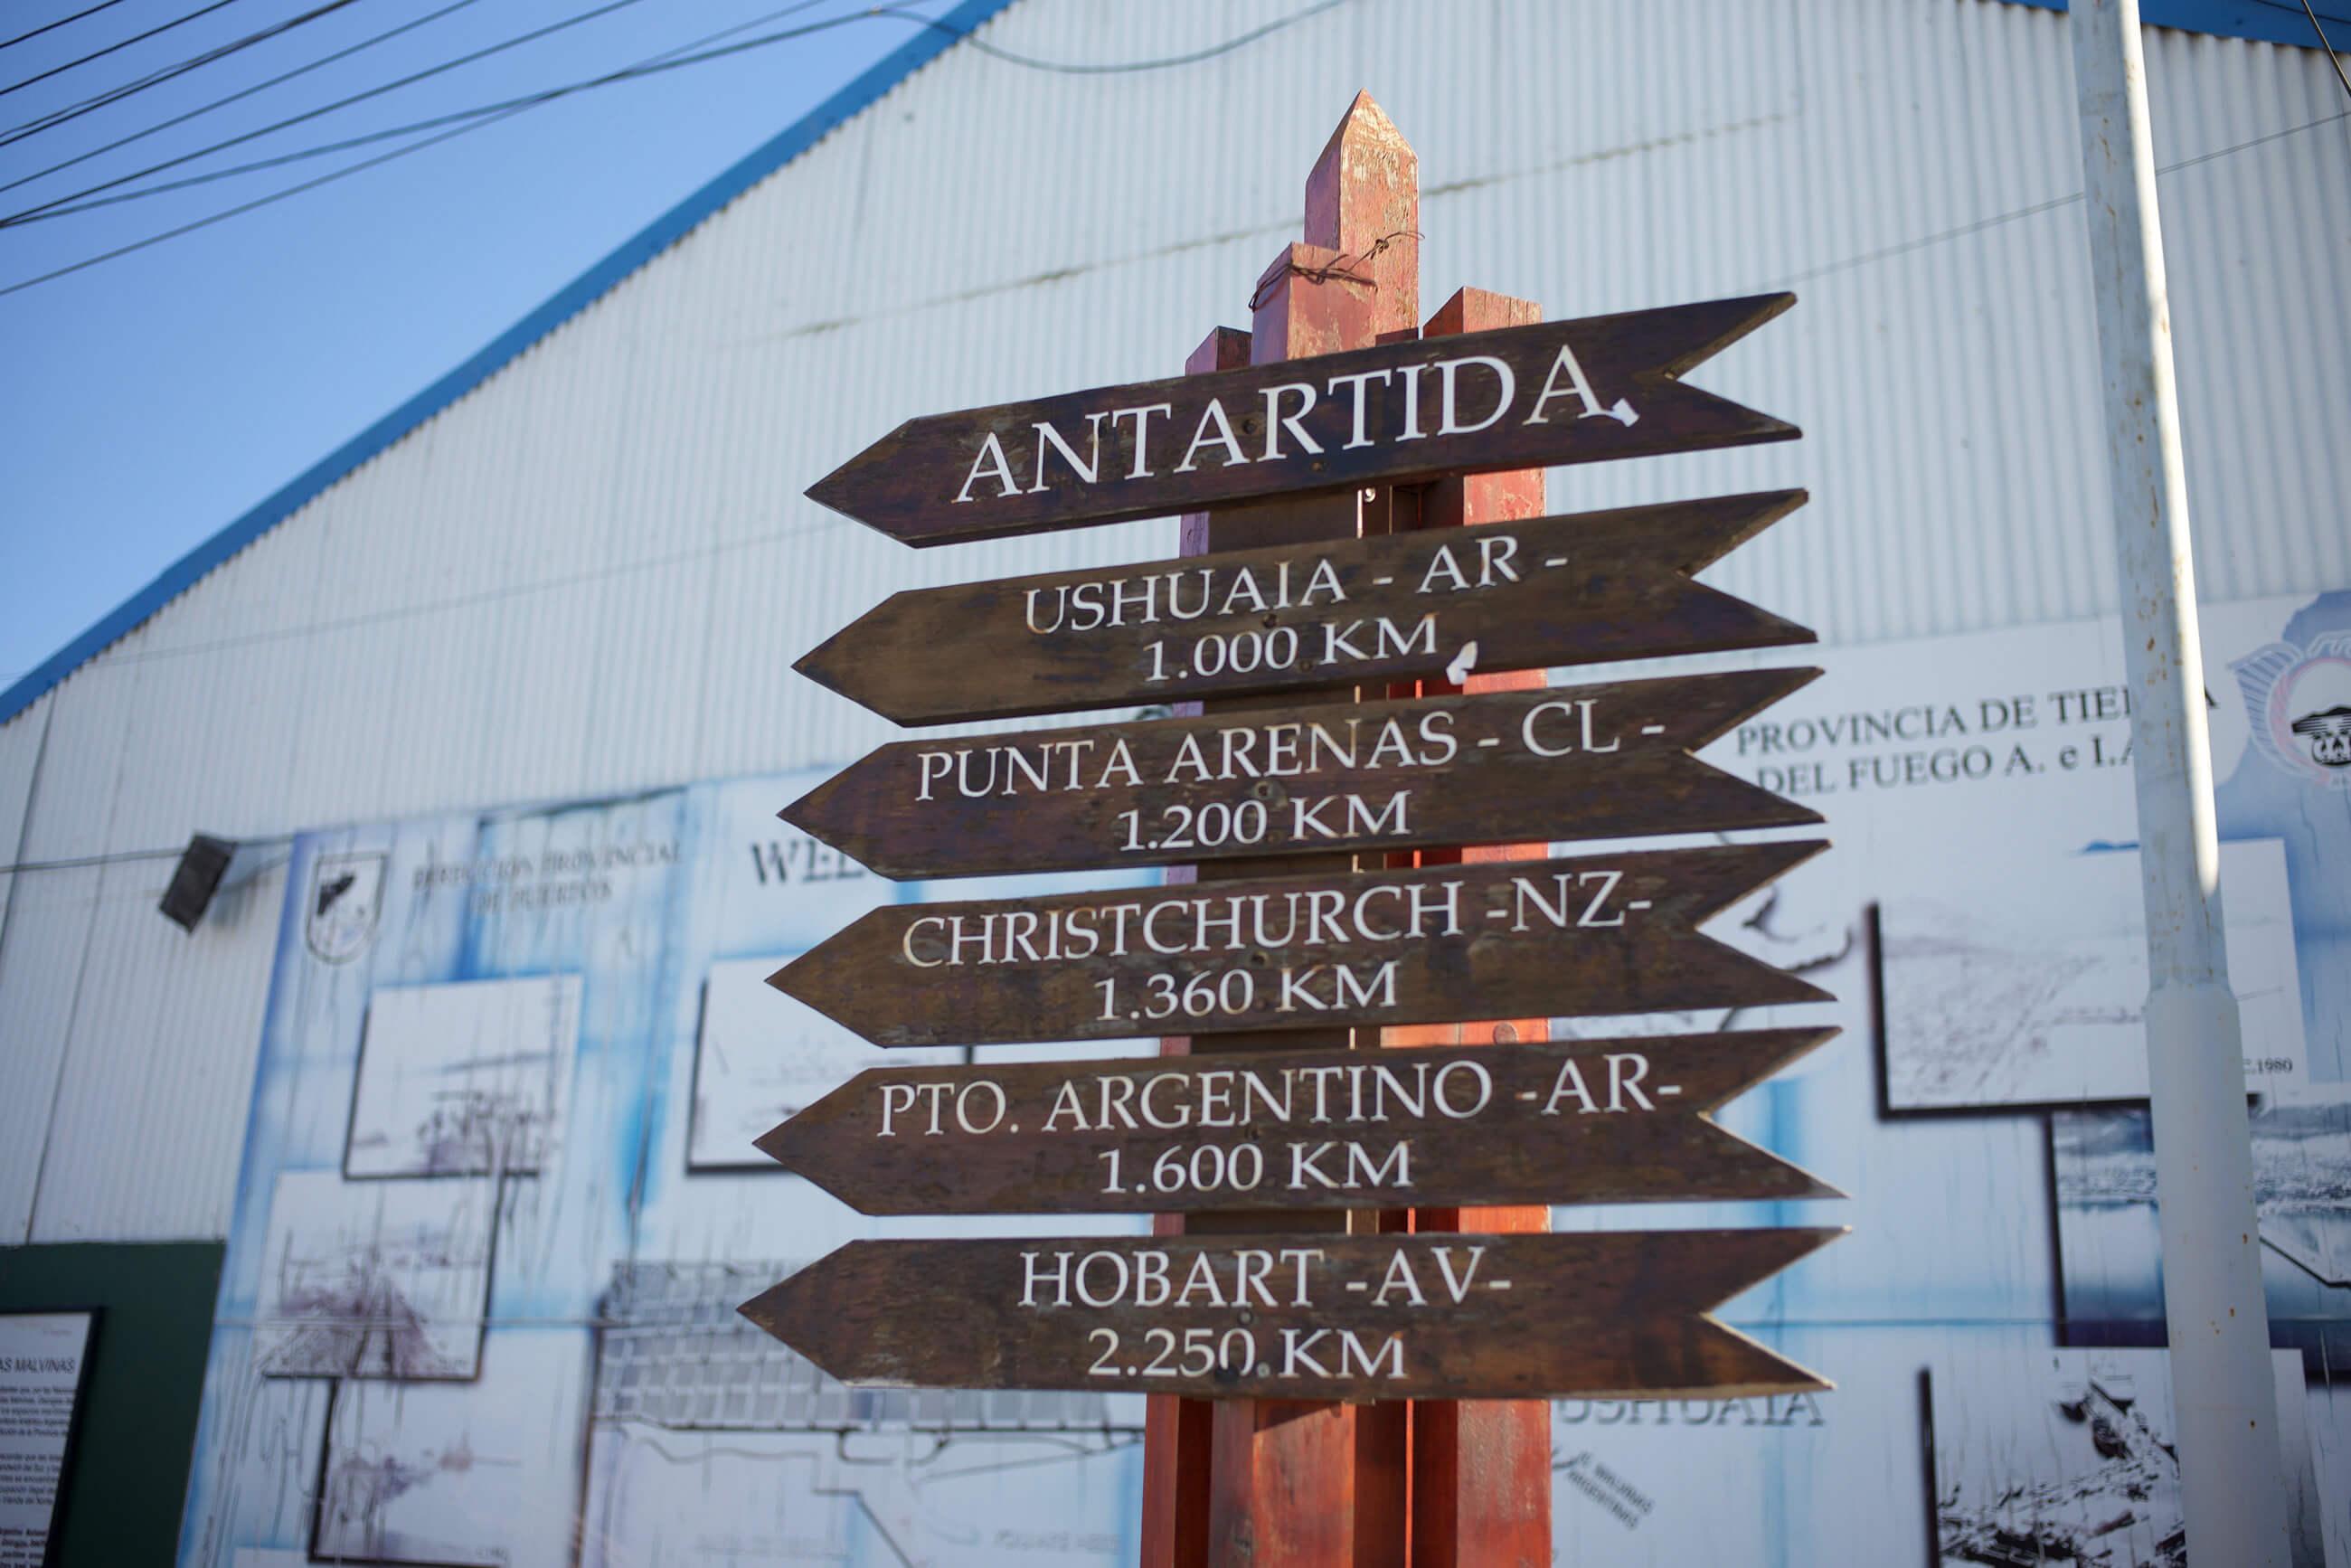 https://bubo.sk/uploads/galleries/5017/lubos_fellner_akodsleko-je-antarktida-z-daneho-miesta.jpg